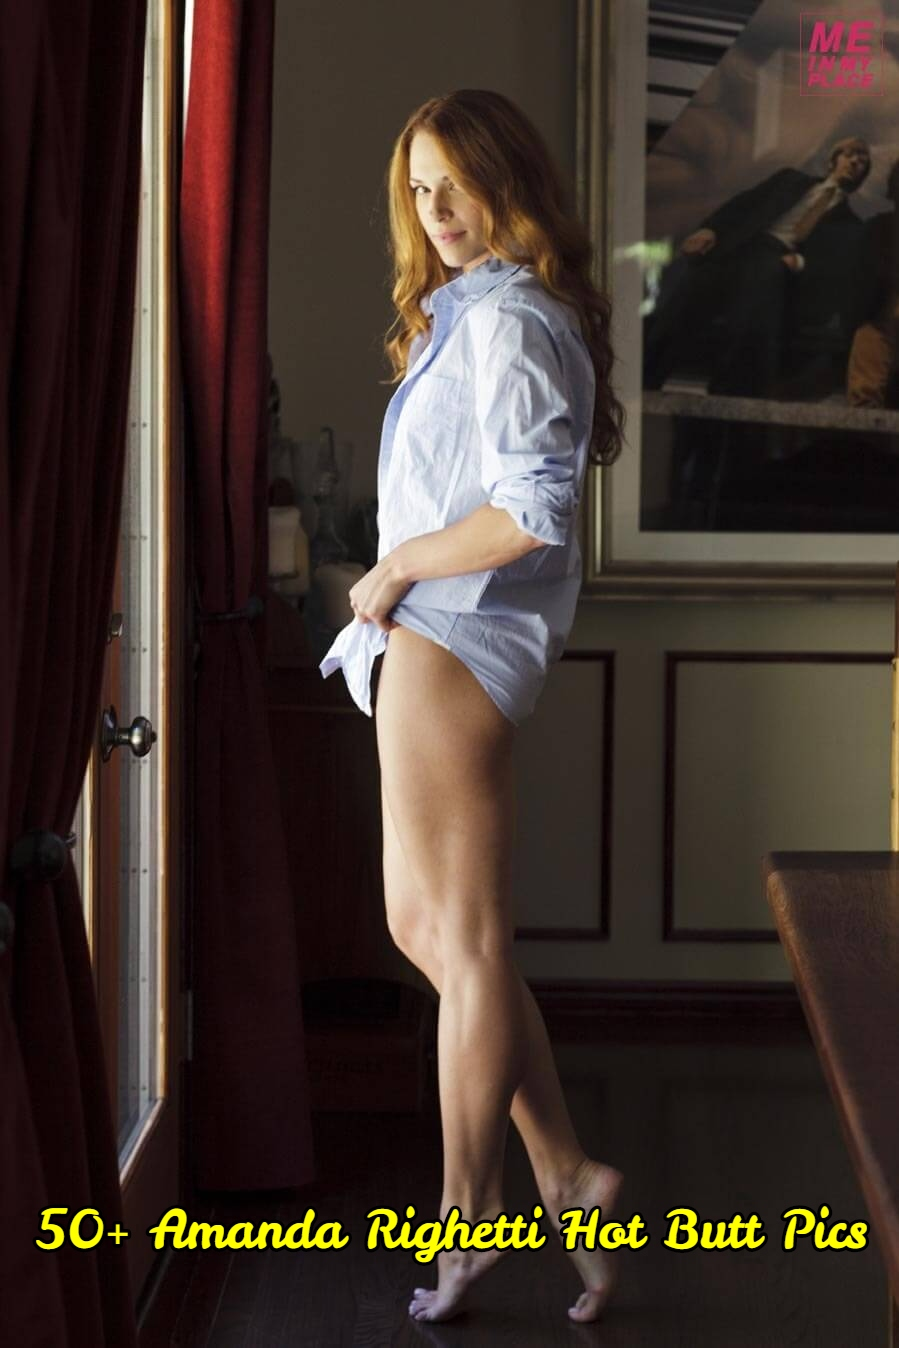 Amanda Righetti Hot Butt Pics